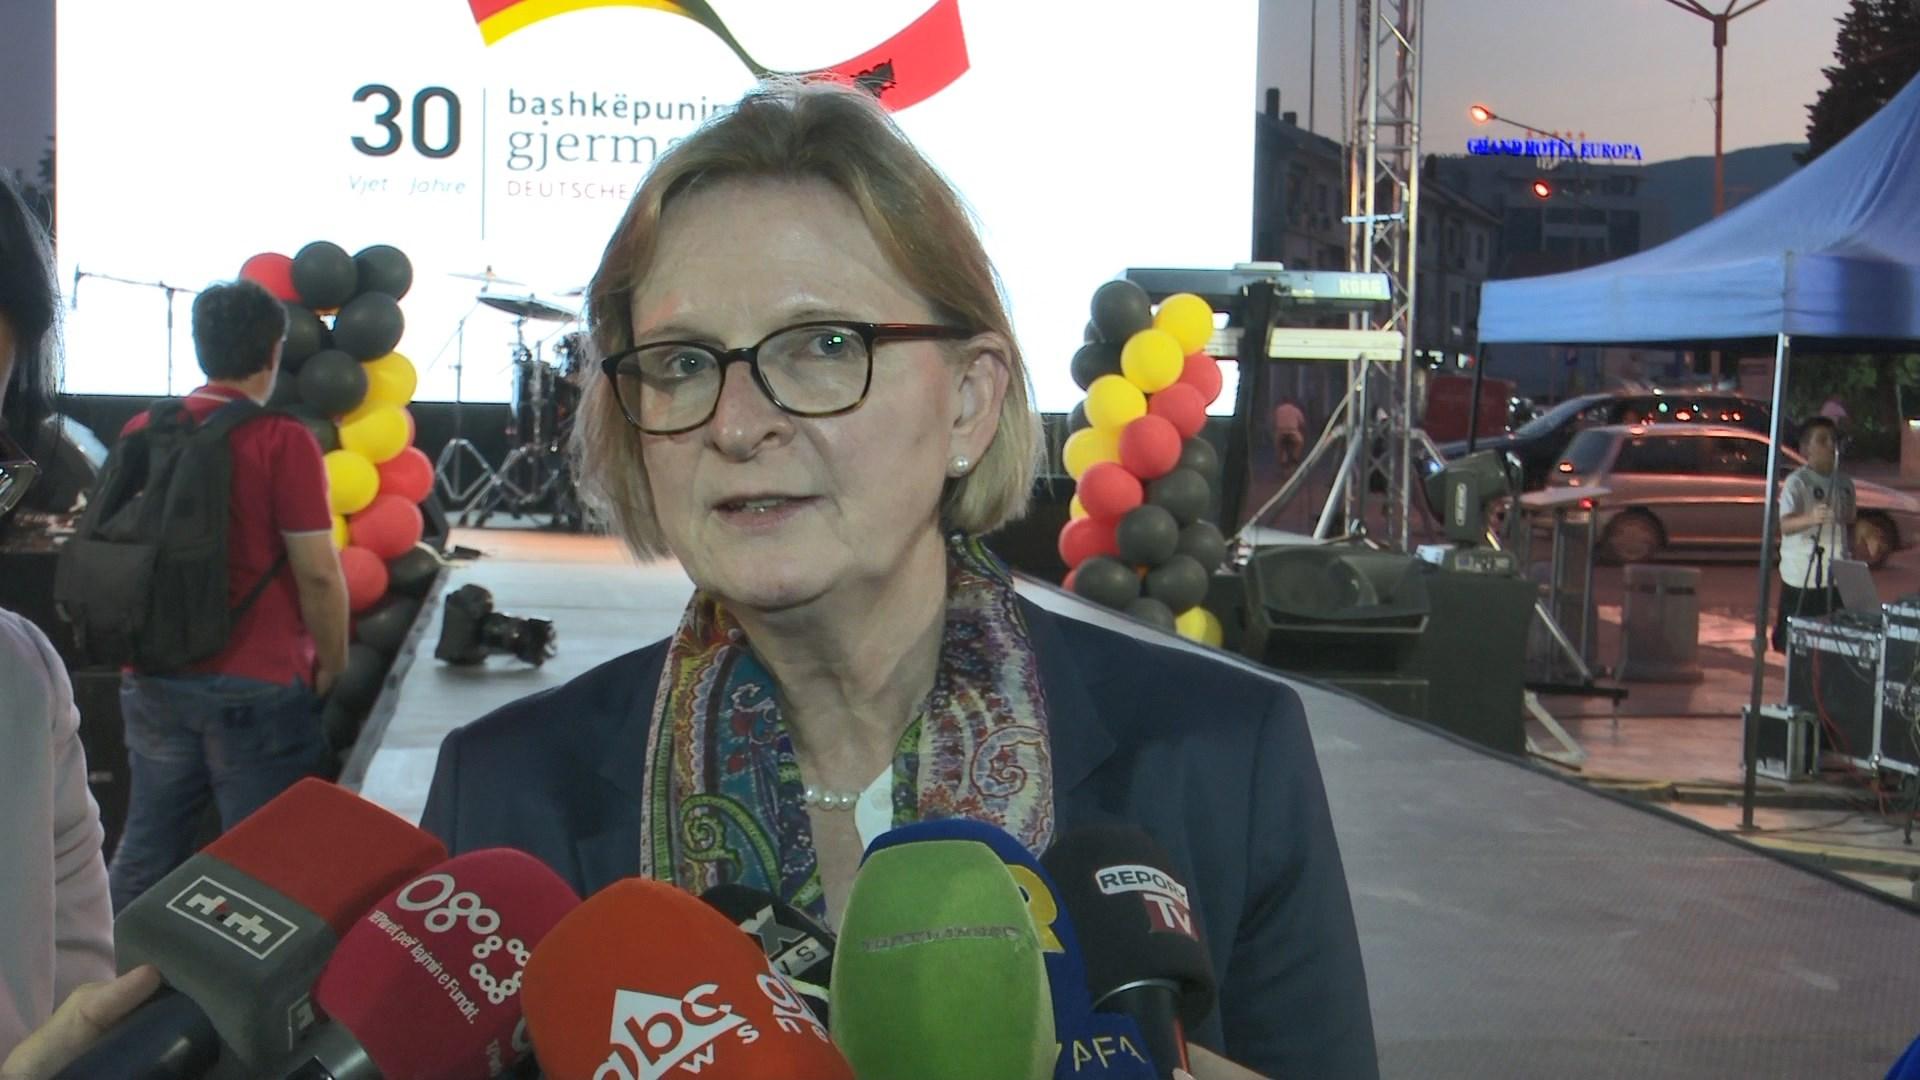 Ambasadorja gjermane: Vetingu po vijon pozitivisht, duhen rezultate